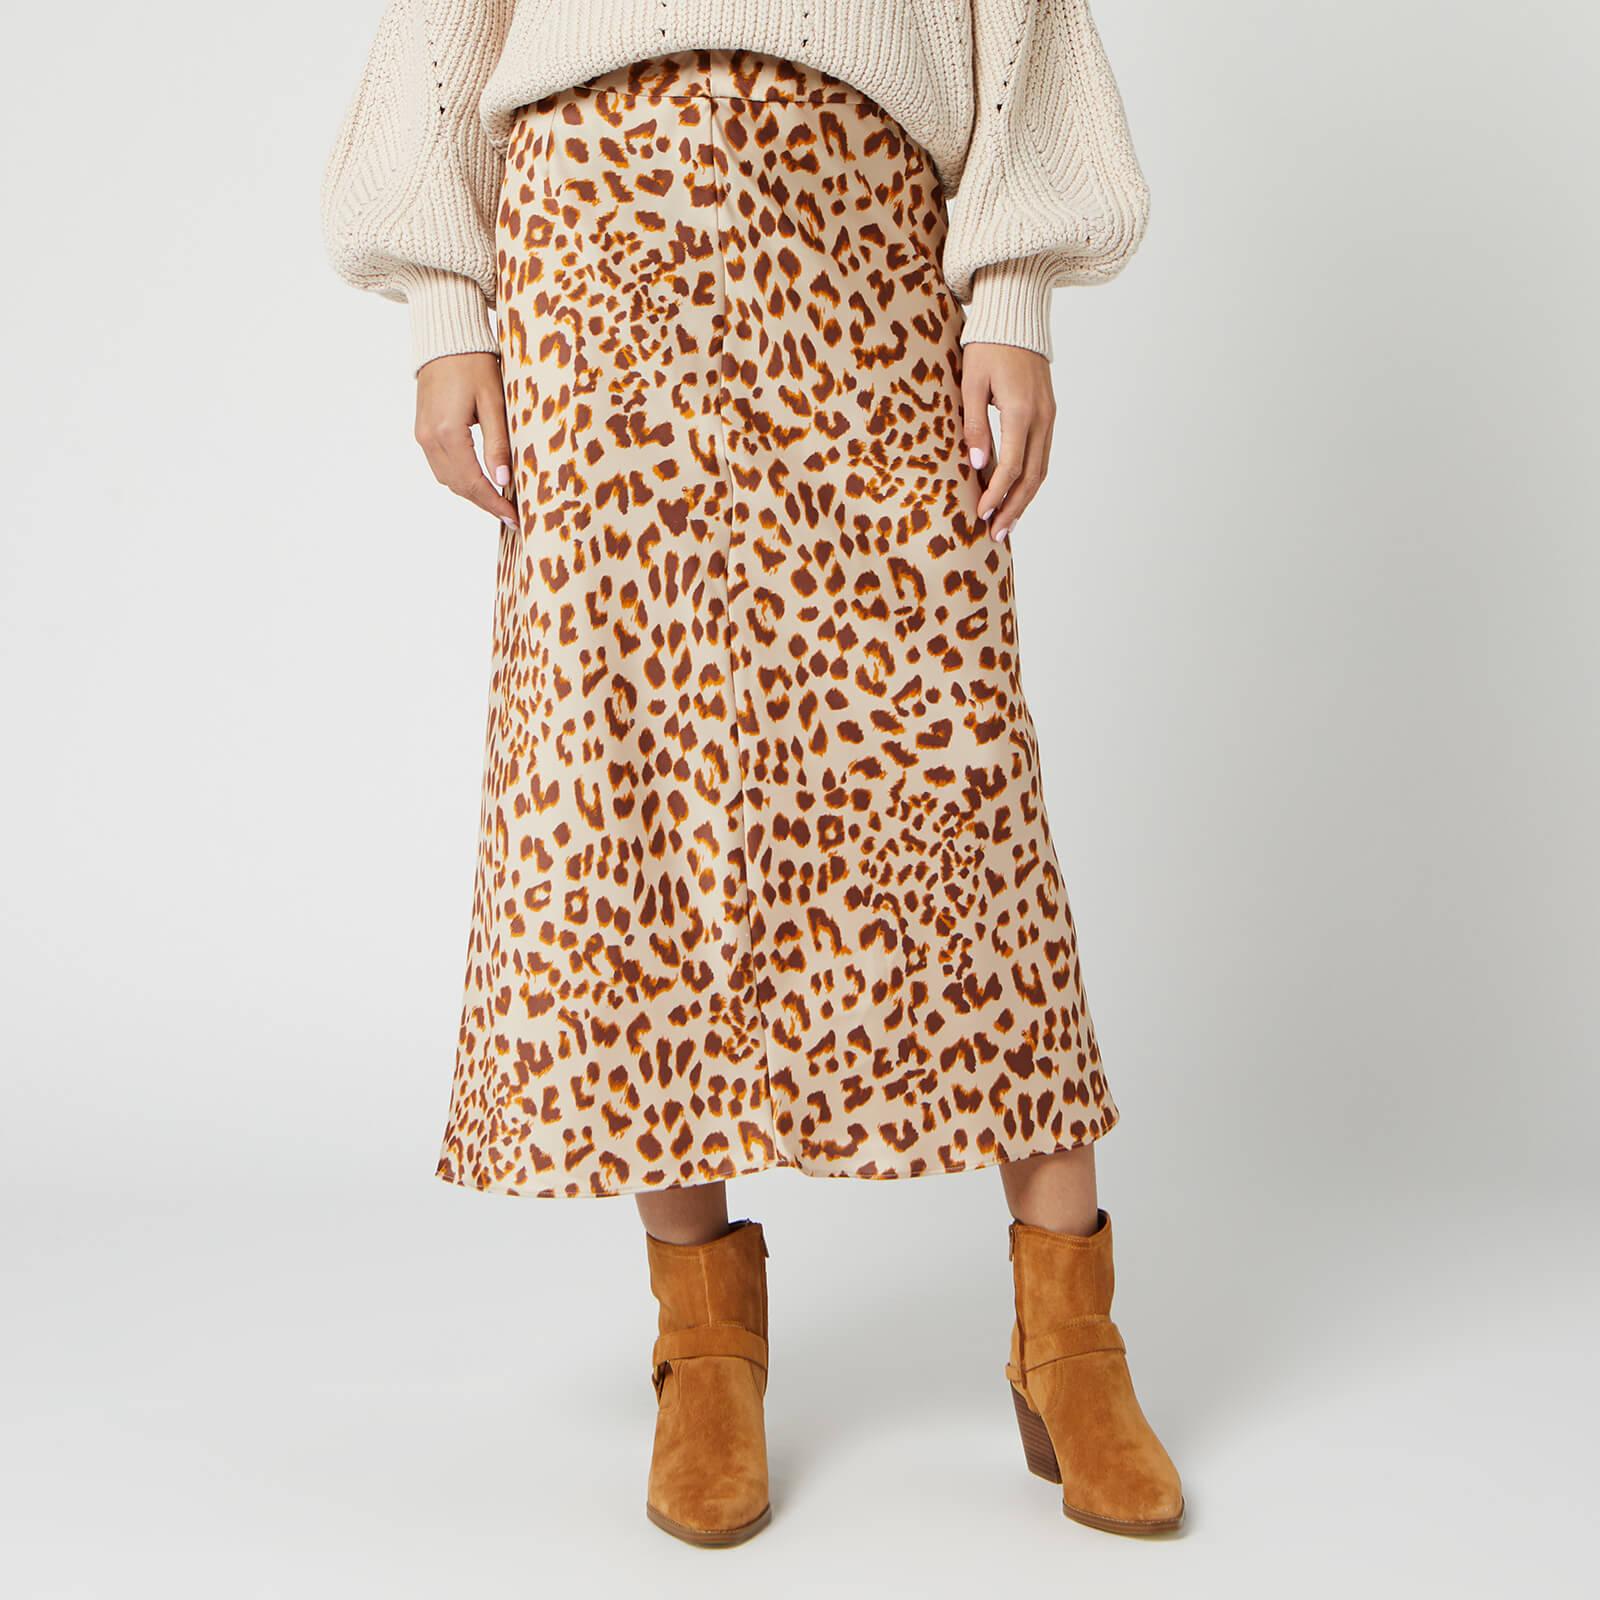 Free People Women's Normani Bias Skirt - Brown Leopard - US 8/UK 12